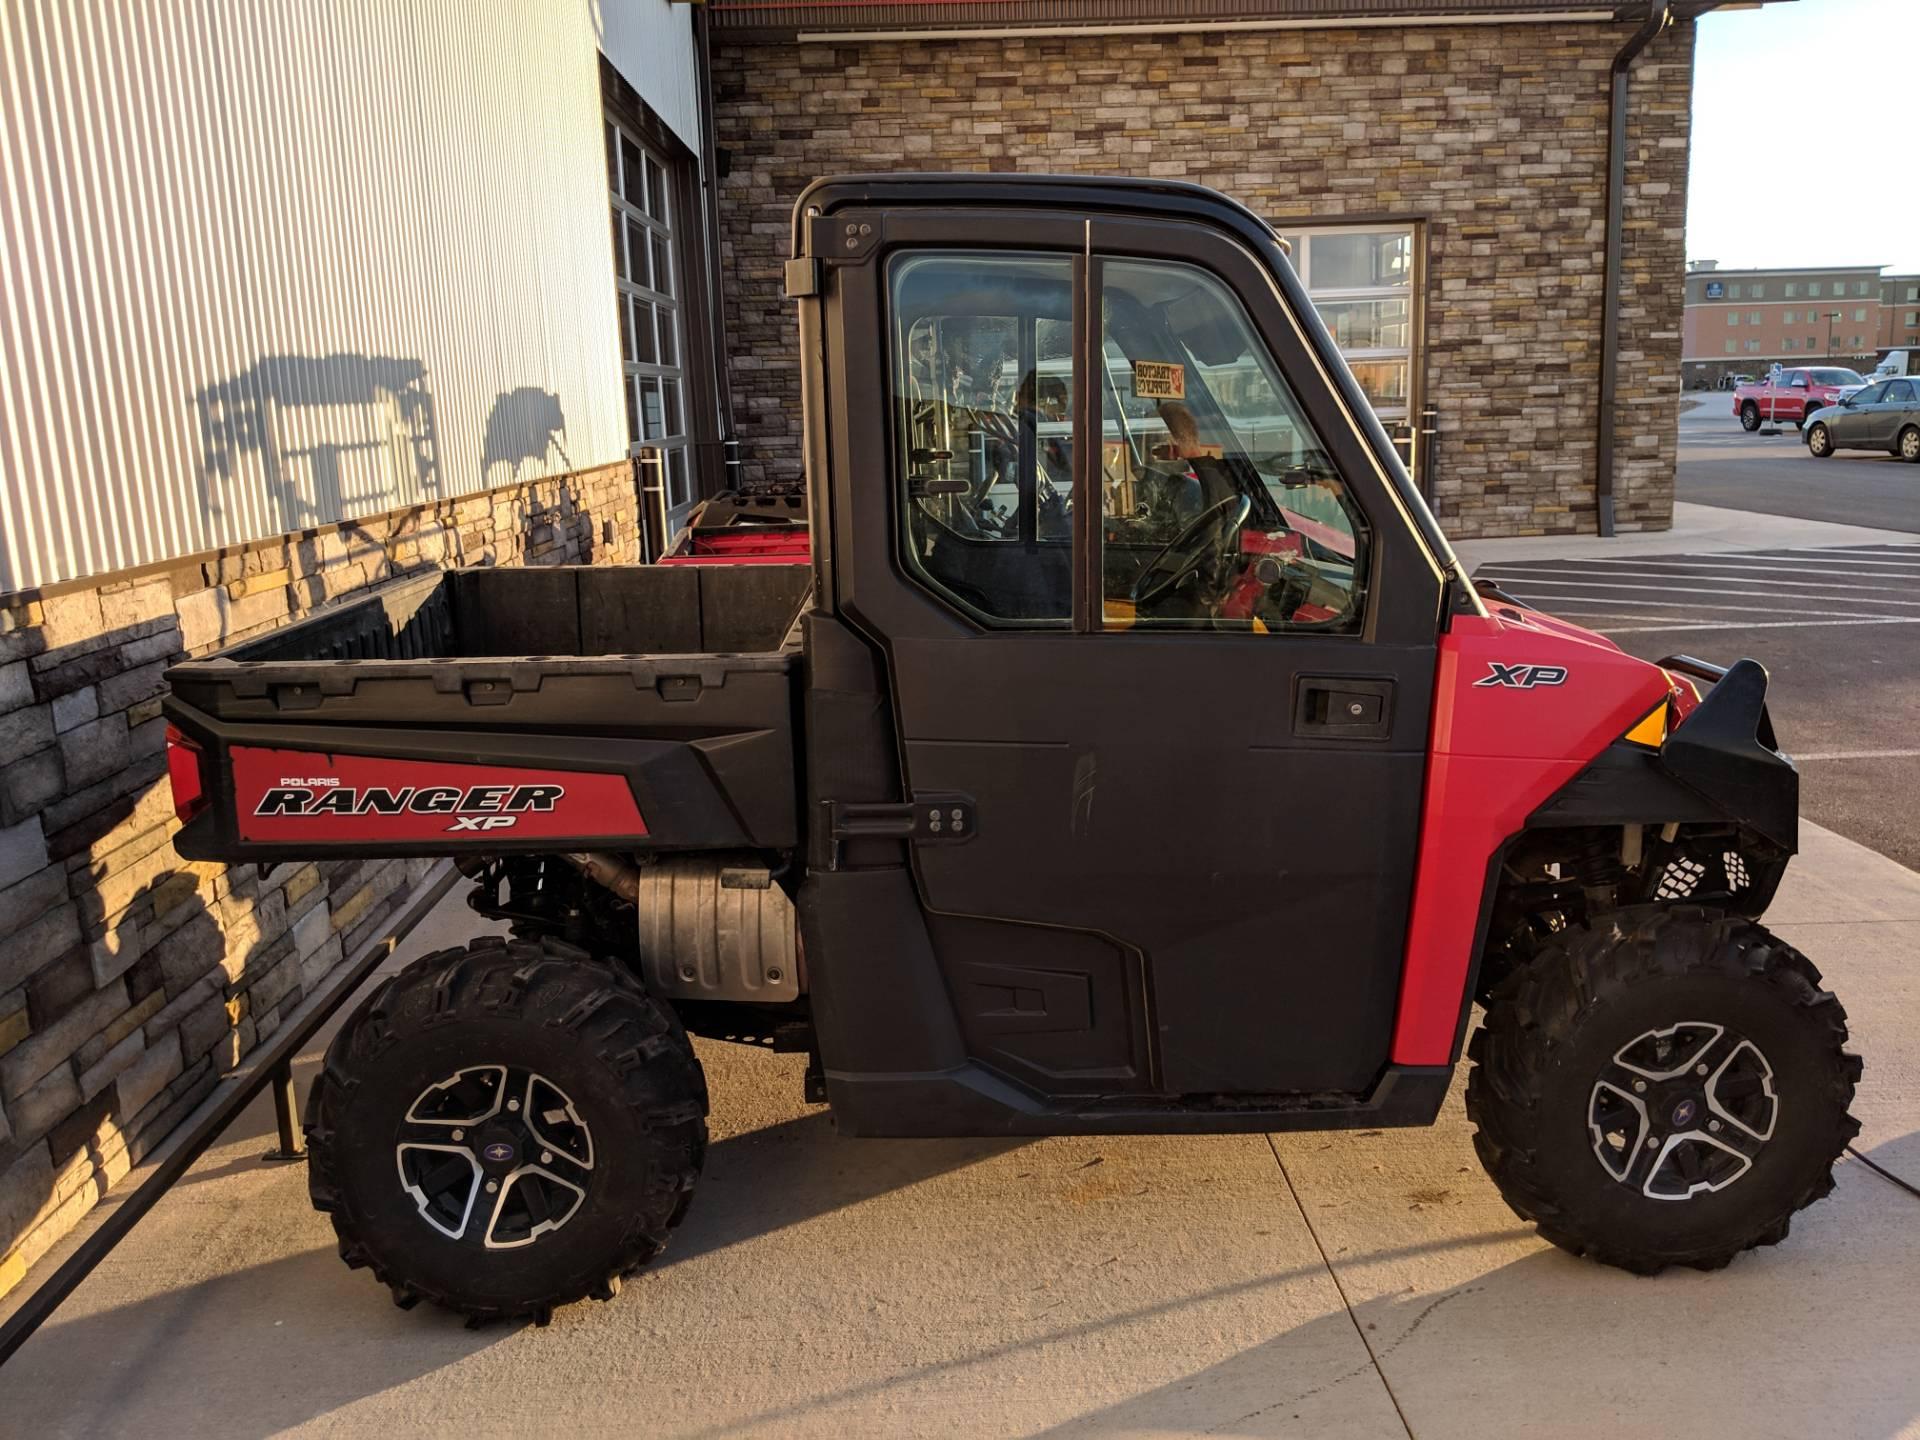 2016 Polaris Ranger Xp 900 Eps In Rapid City South Dakota Photo 1